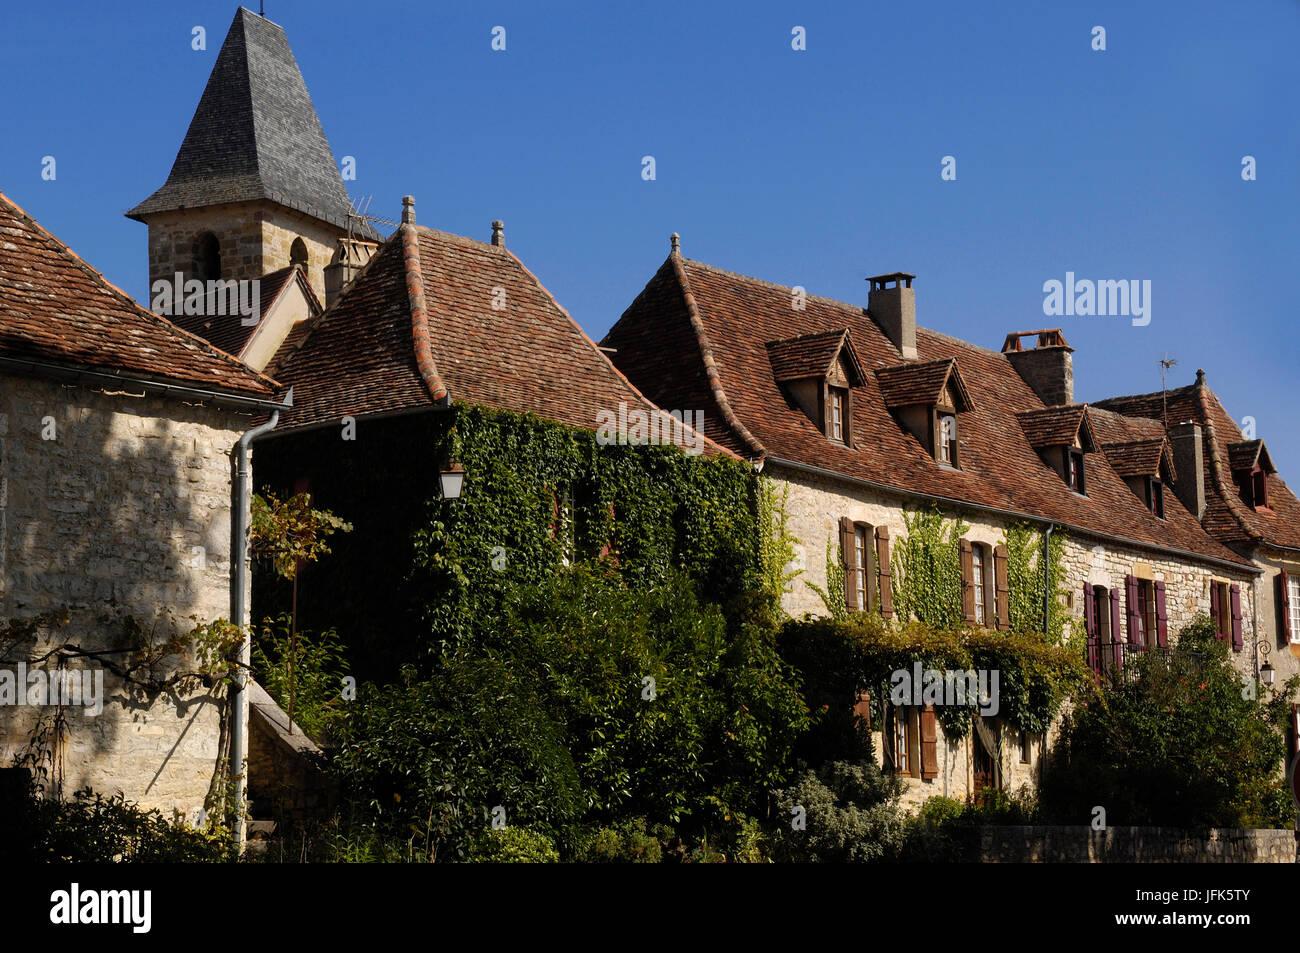 Medieval Village of Loubressac, Lot, France Stock Photo